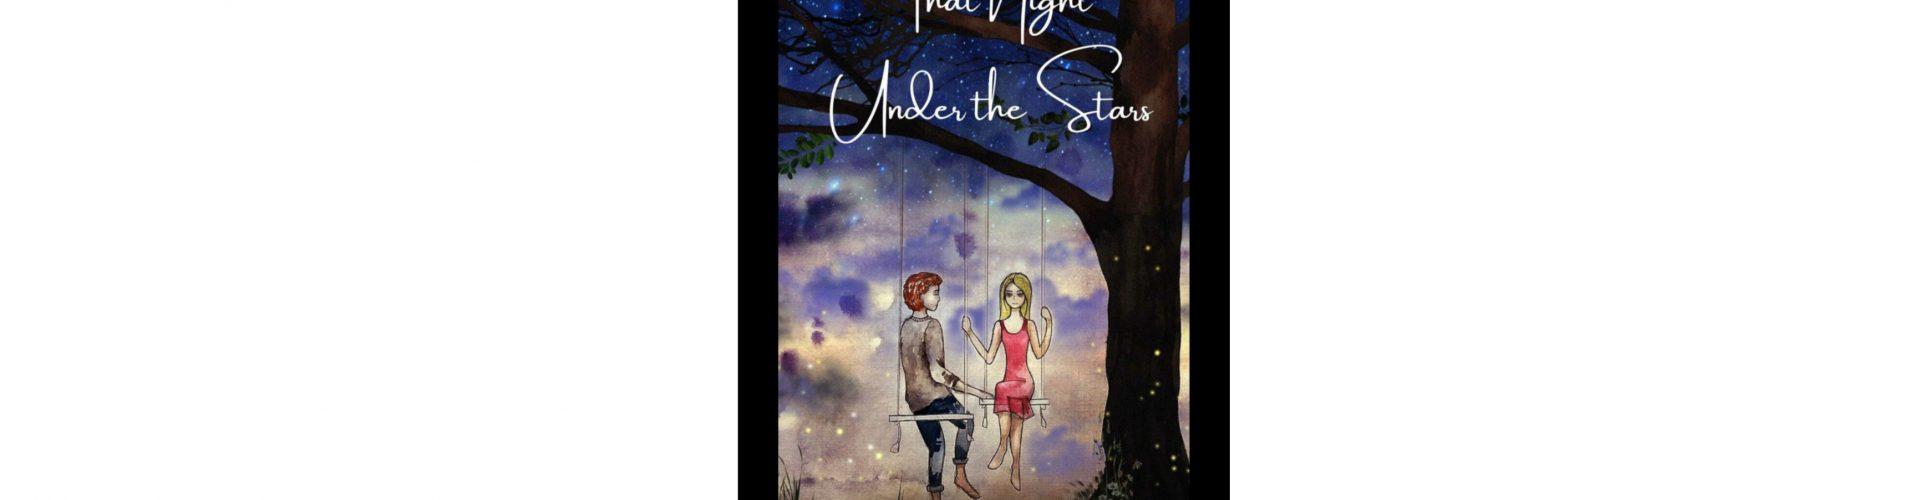 that night under the stars